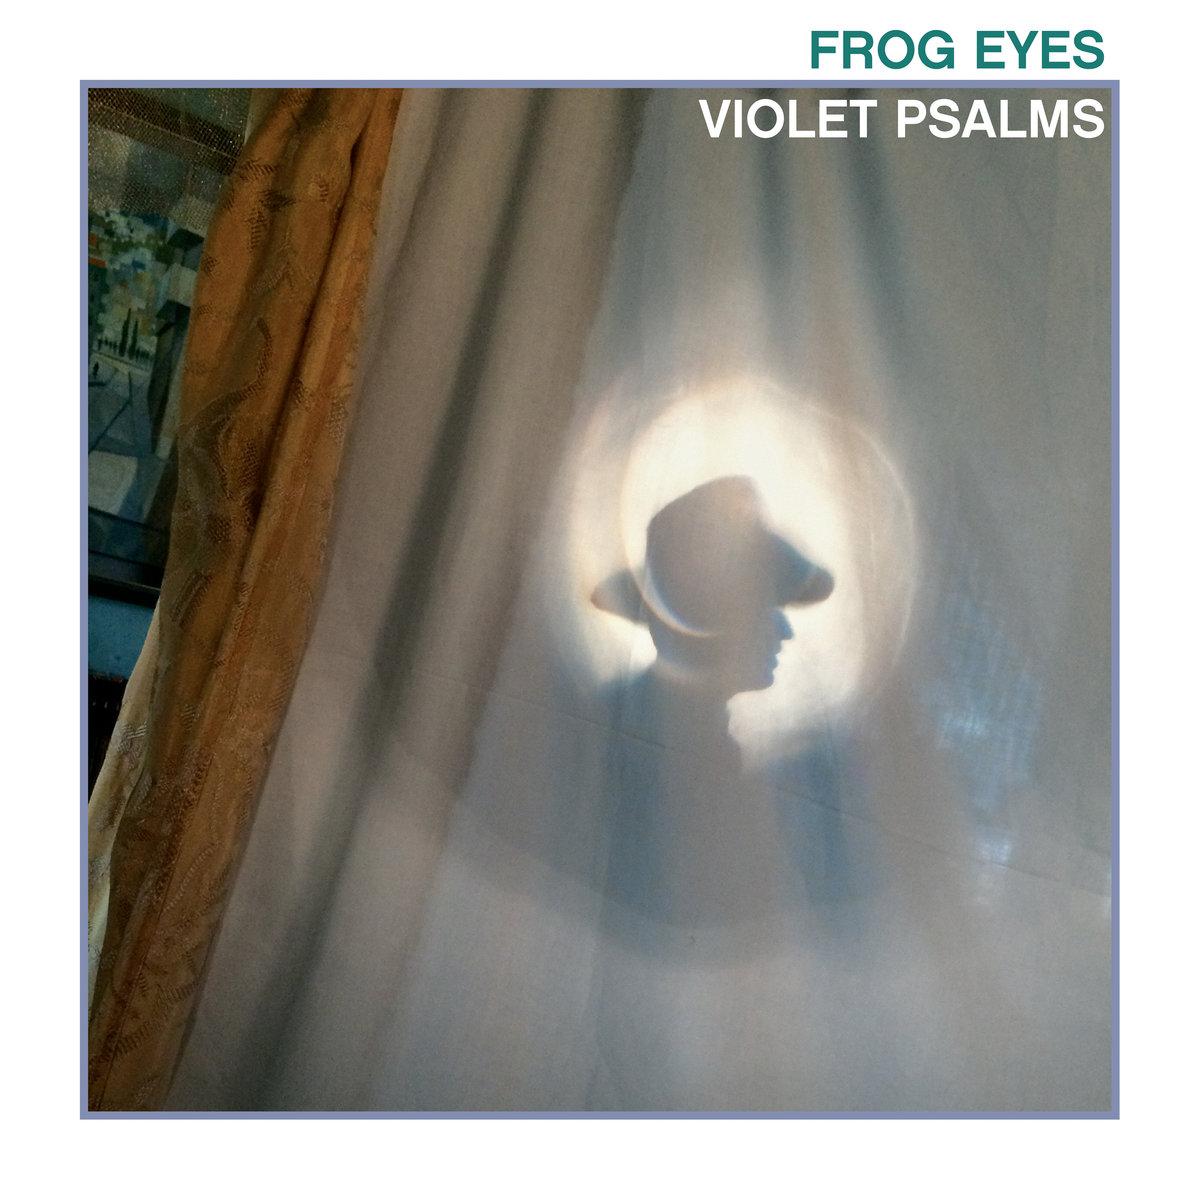 Frog Eyes - Violent Psalms  Artwork by Carol Sawyer